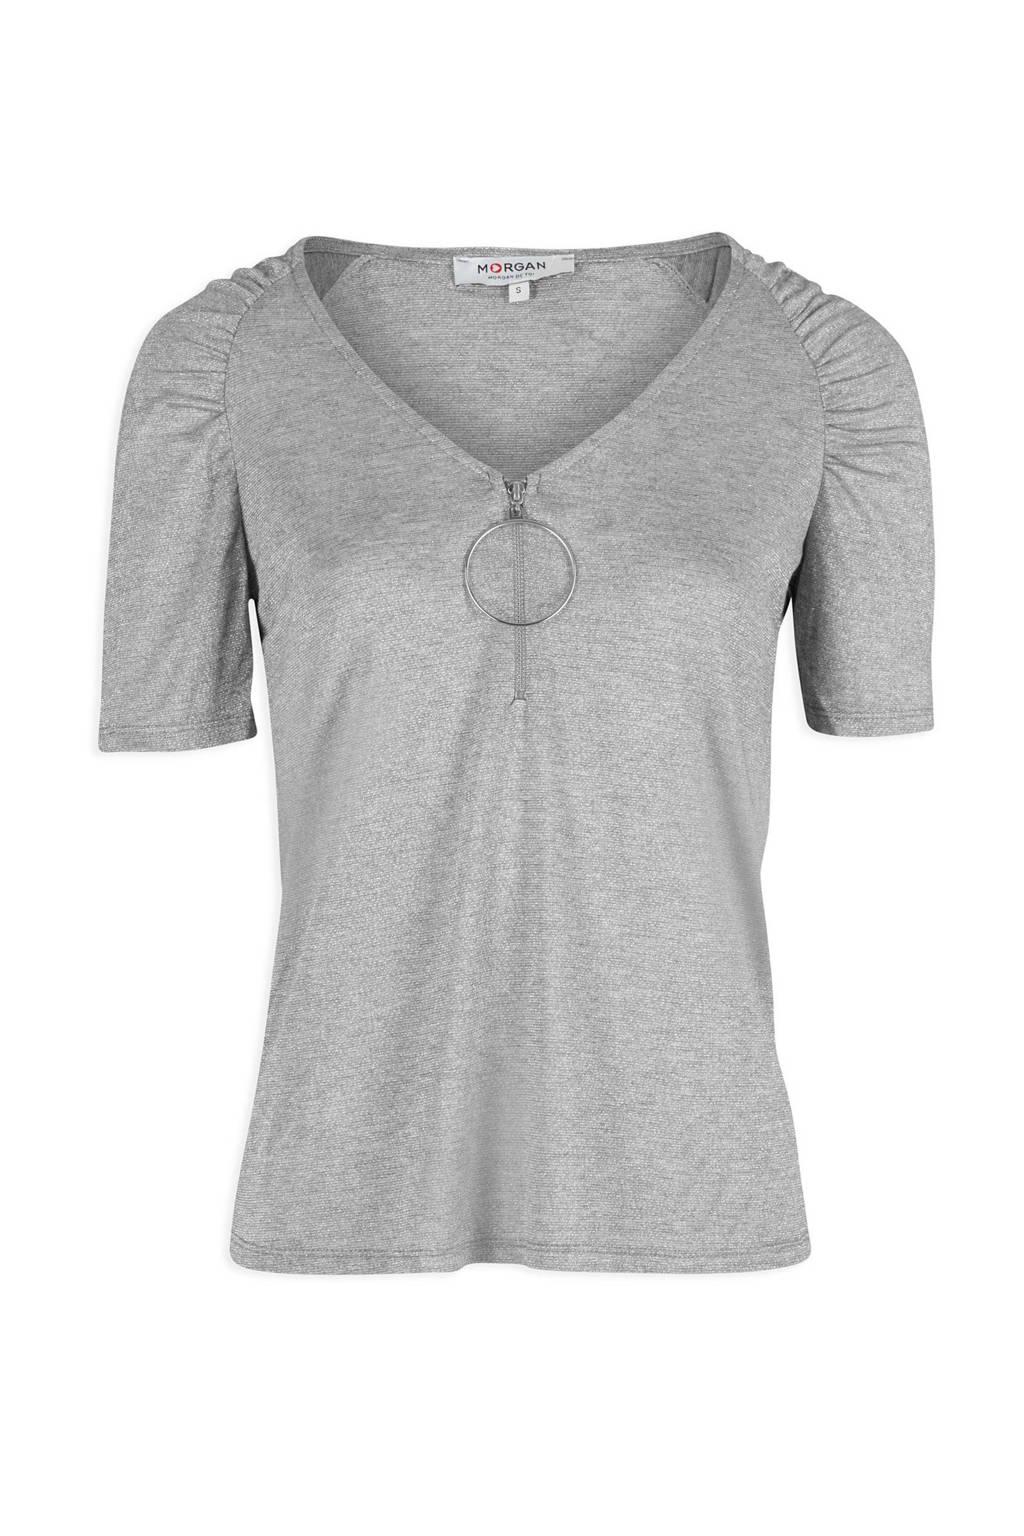 Morgan glitter T-shirt met rits grijs, Zilver